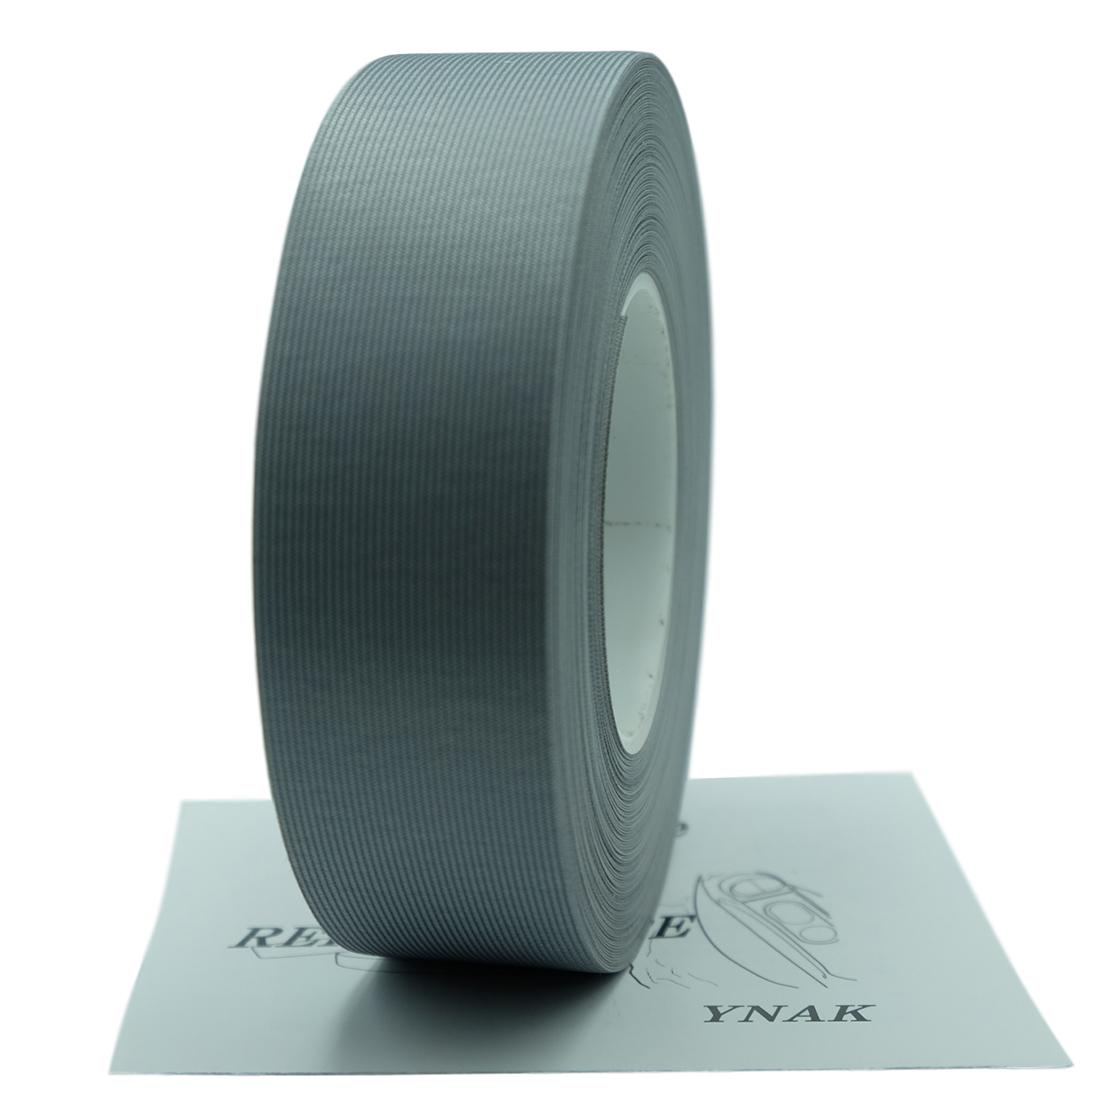 YNAK テント ザック タープ シート レインウェアー 補修 メンテナンス 用 強力 トリコット 表面布状 アイロン式 3レイヤー適合 説明書付き シームテープ (グレー,幅30mm×20m)